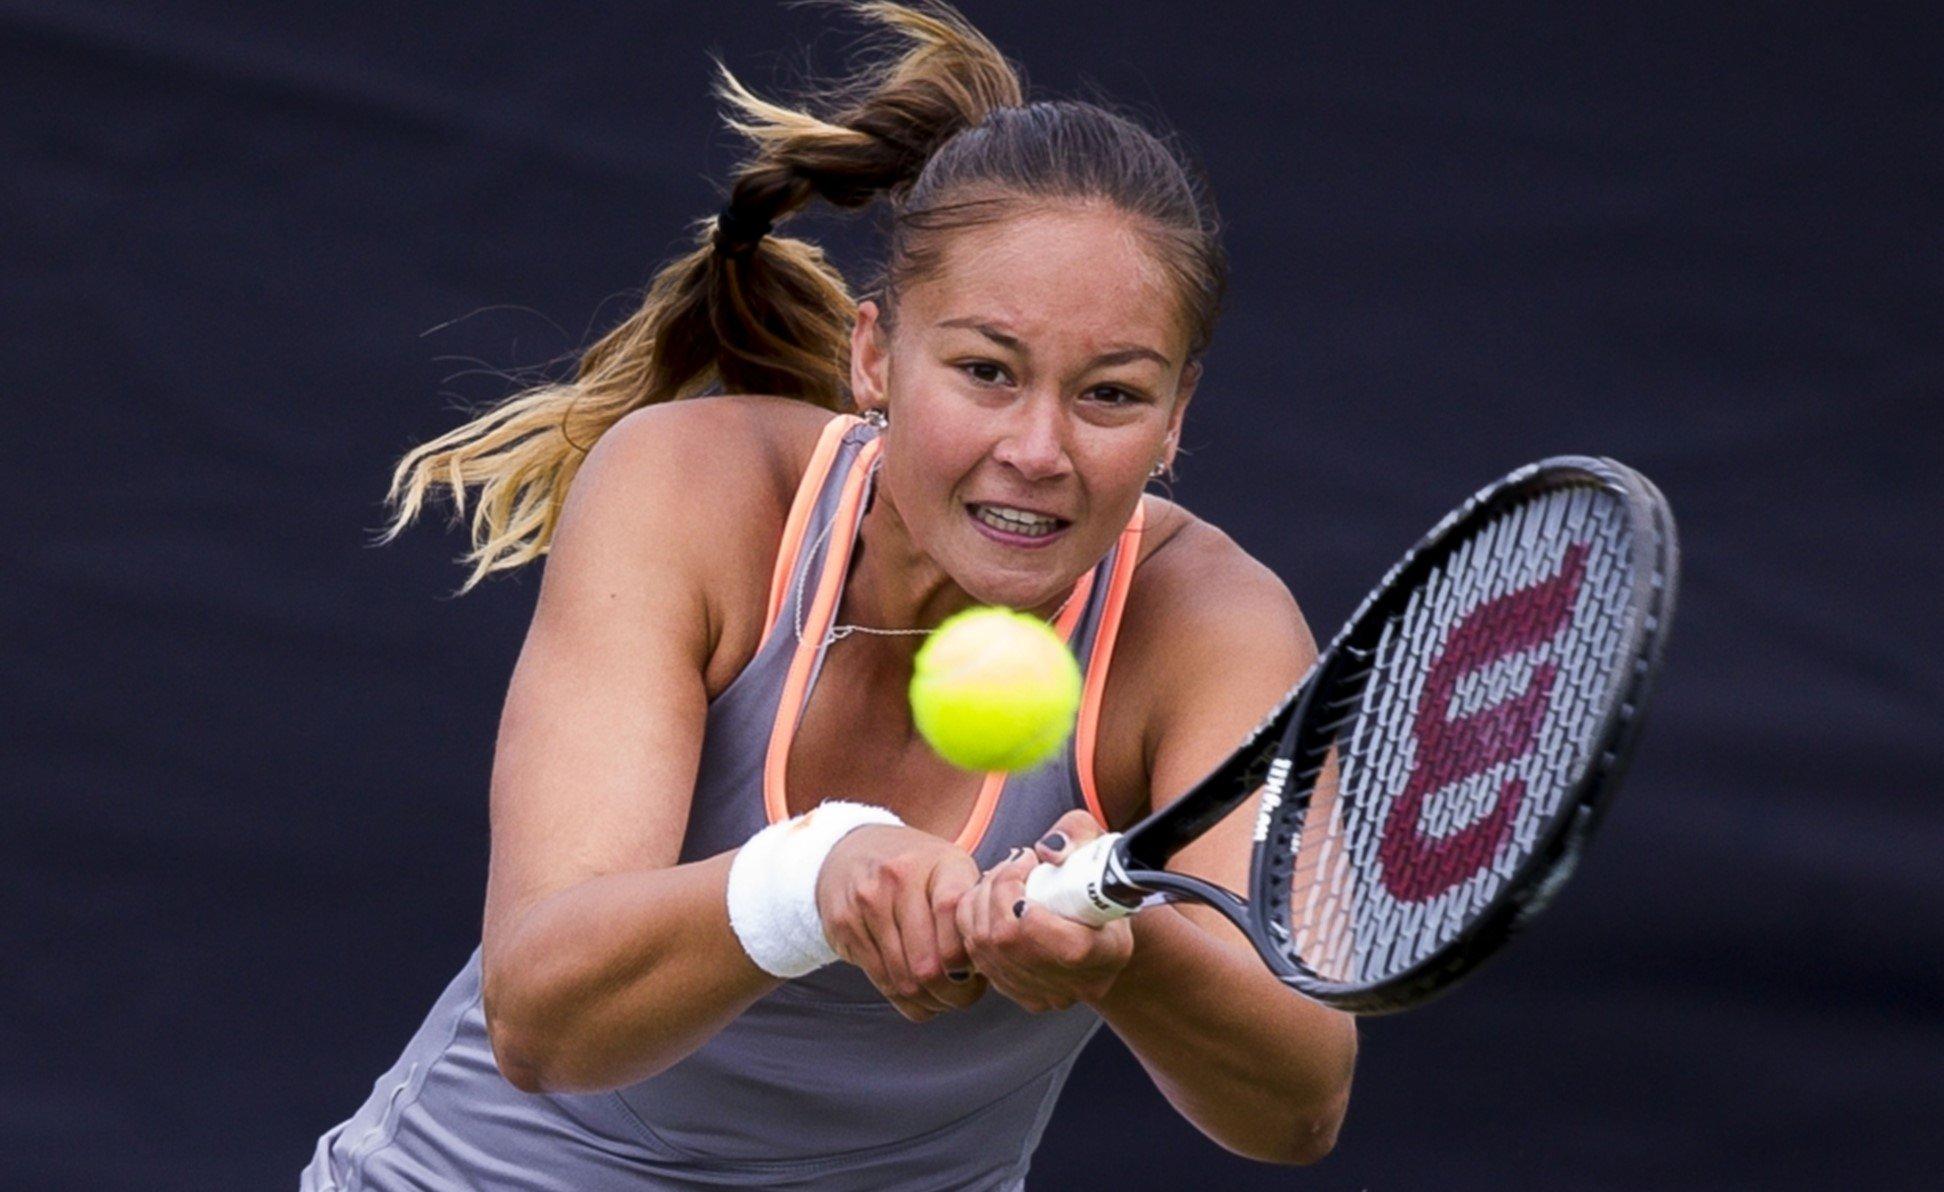 Прогноз на матч: Гарбинье Мугуруса – Анастасия Севастова – 8 августа 2018 года